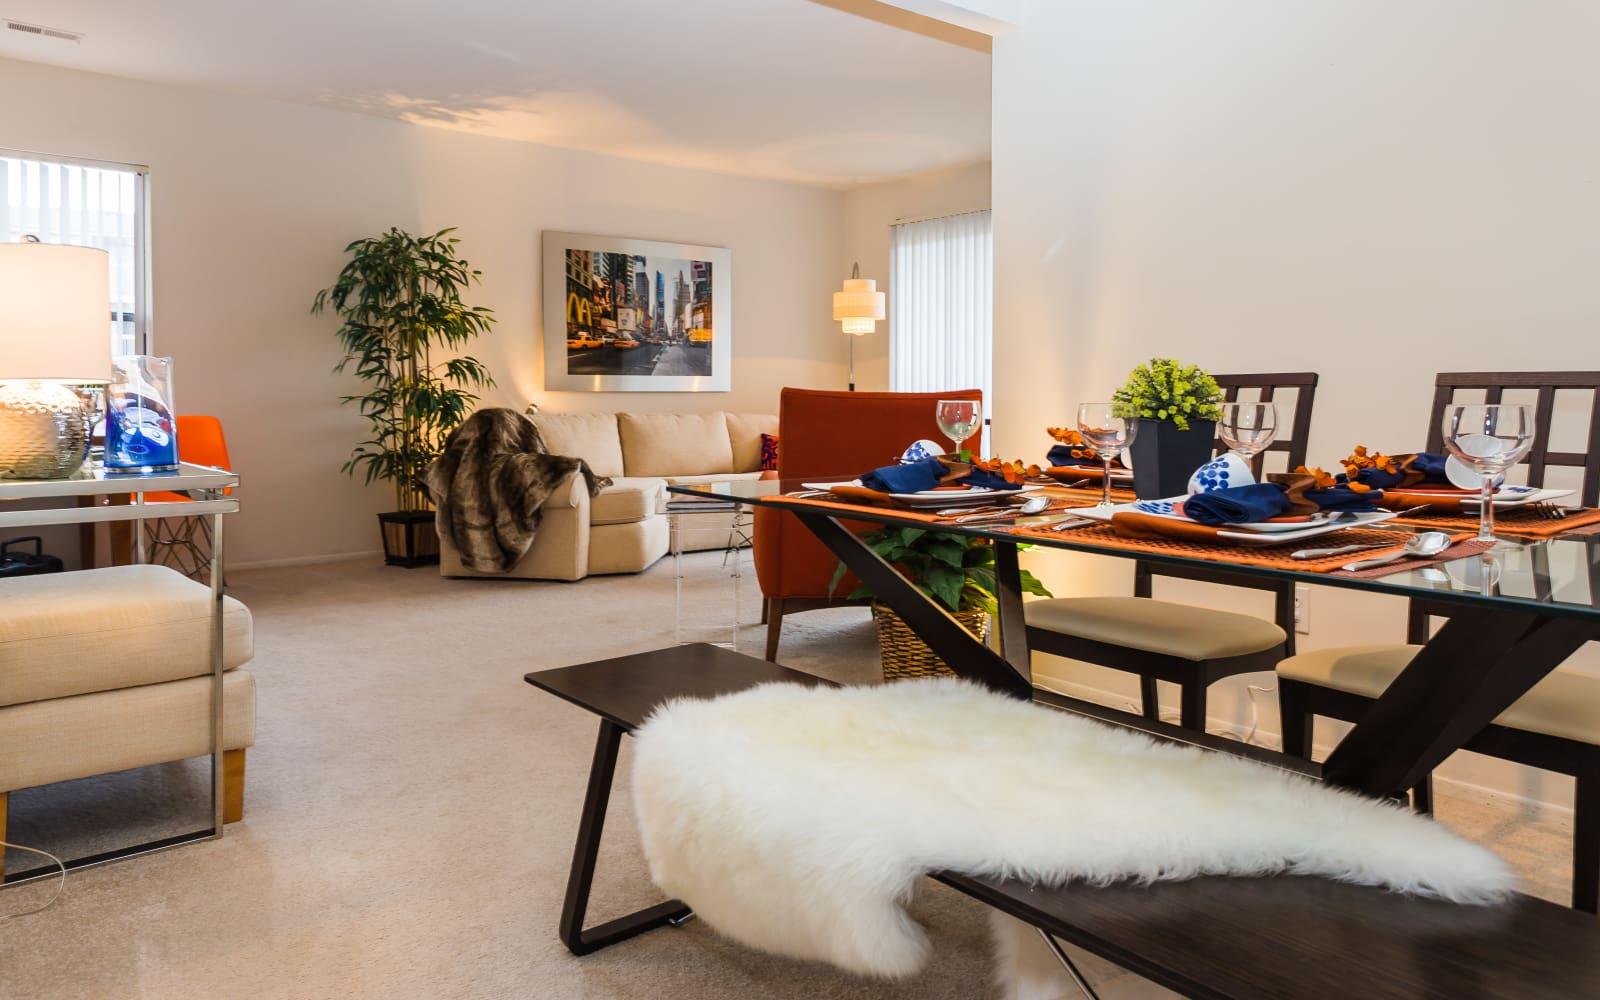 Spacious living area at Fairmont Park Apartments in Farmington/Farmington Hills, Michigan